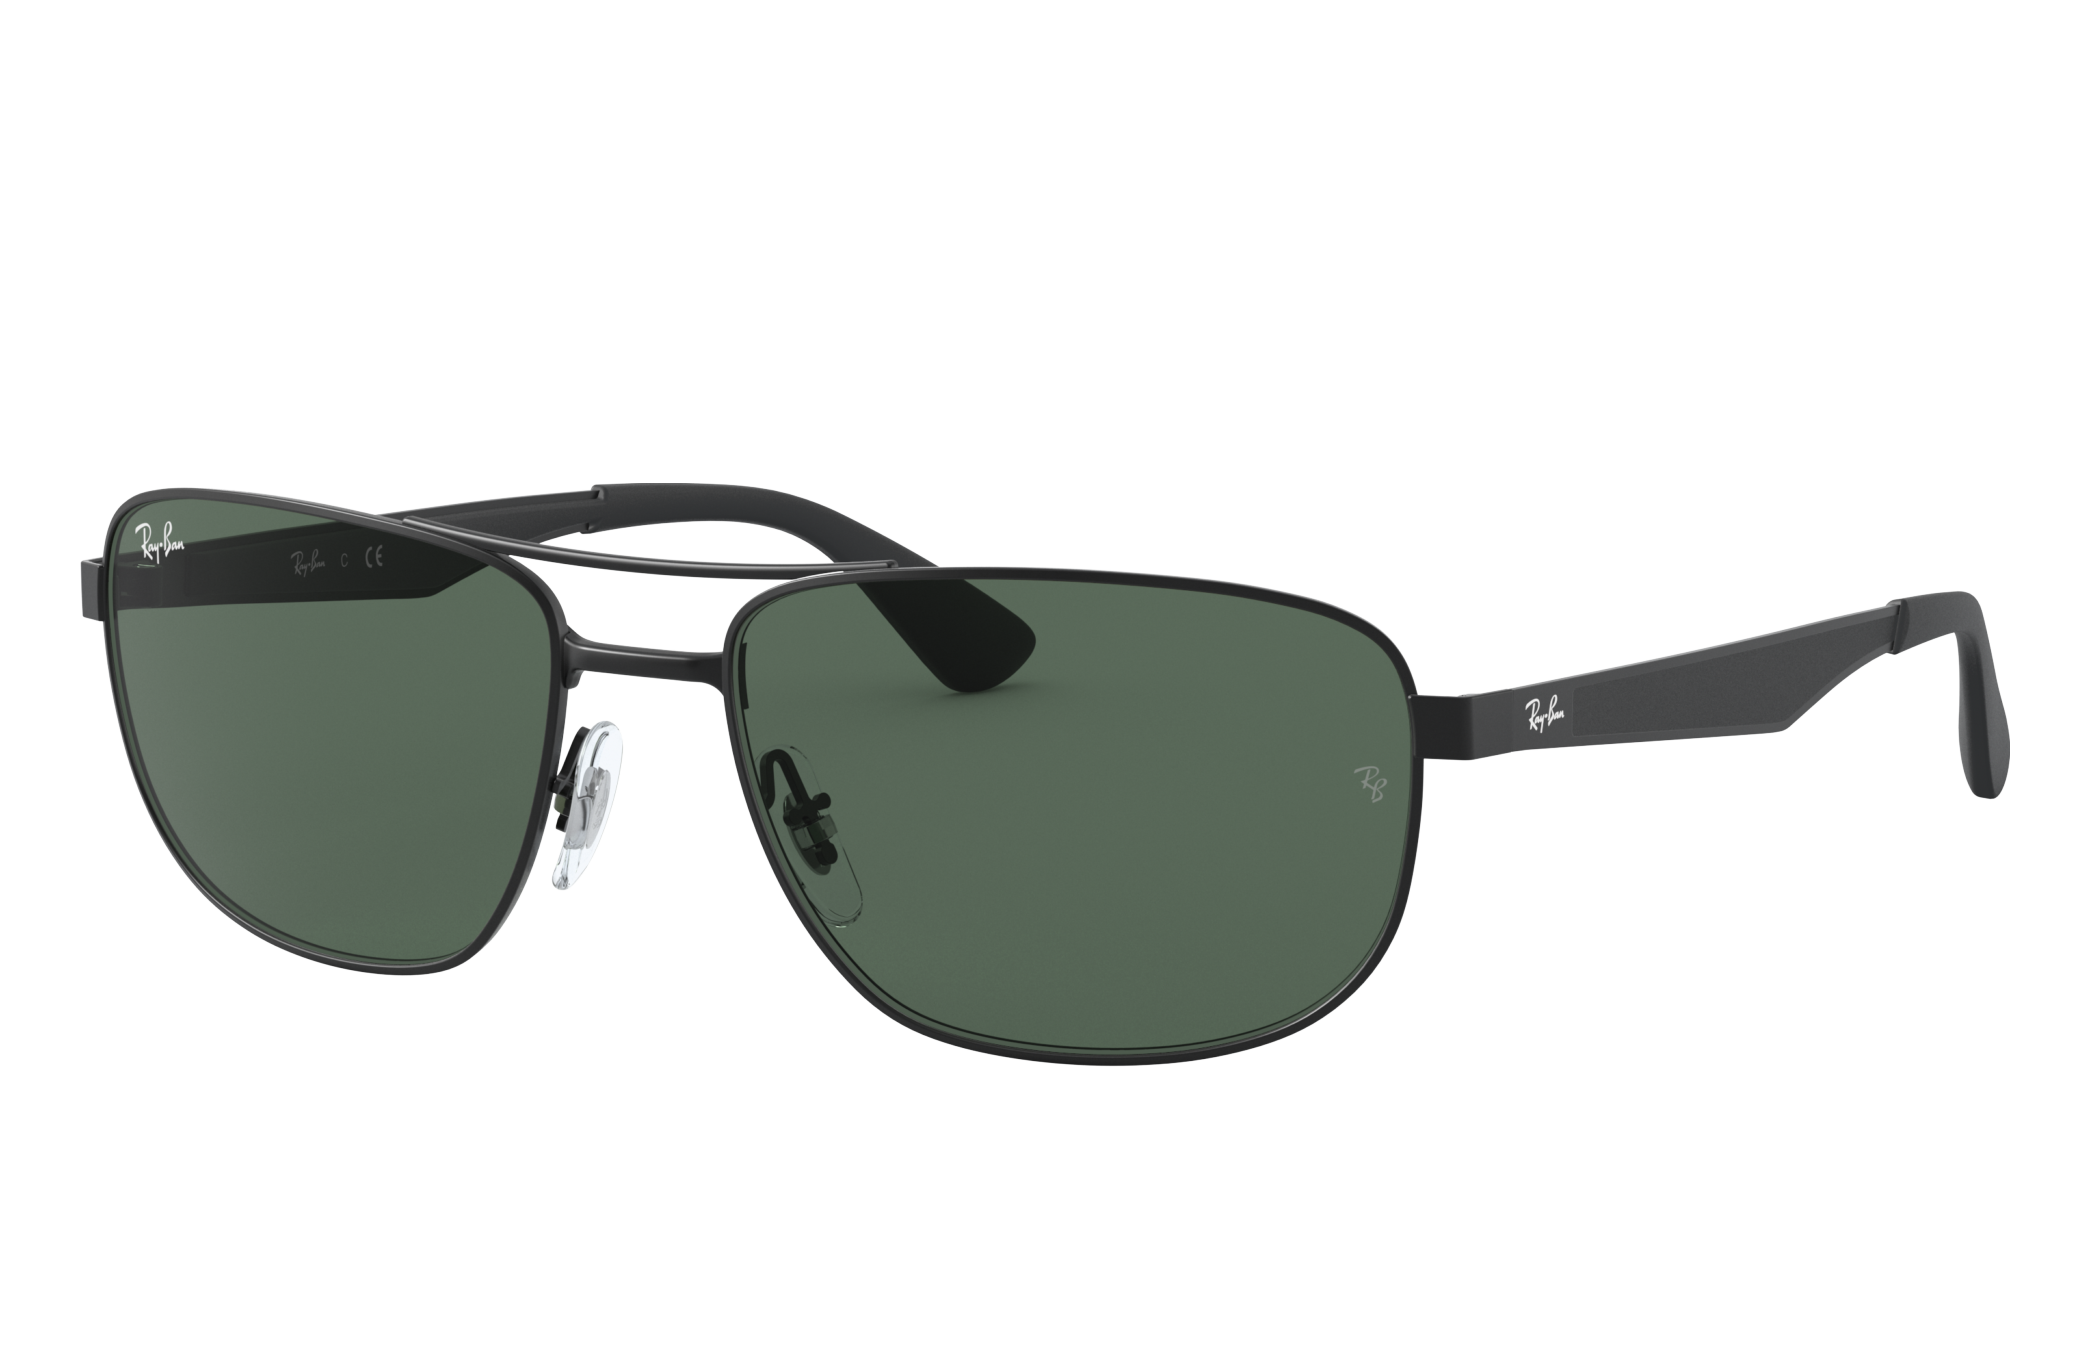 Ray-Ban Rb3528 Black, Green Lenses - RB3528